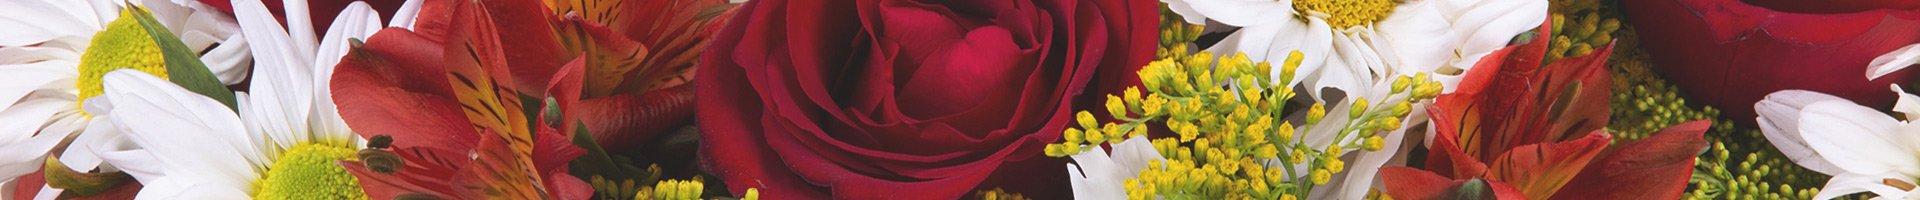 giuliana flores na mídia